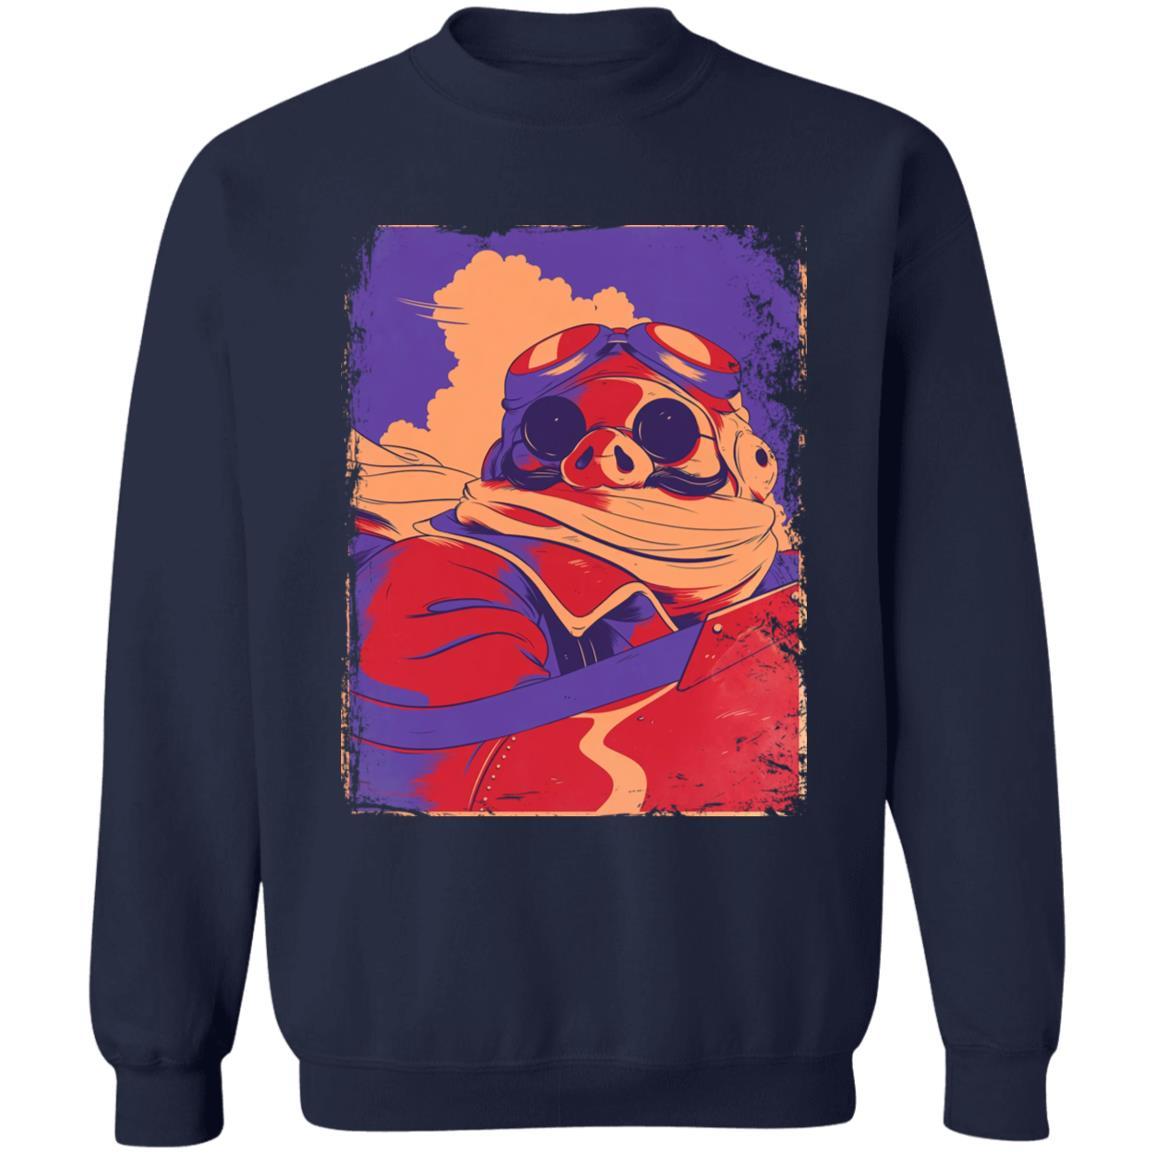 Porco Rosso Retro Sweatshirt